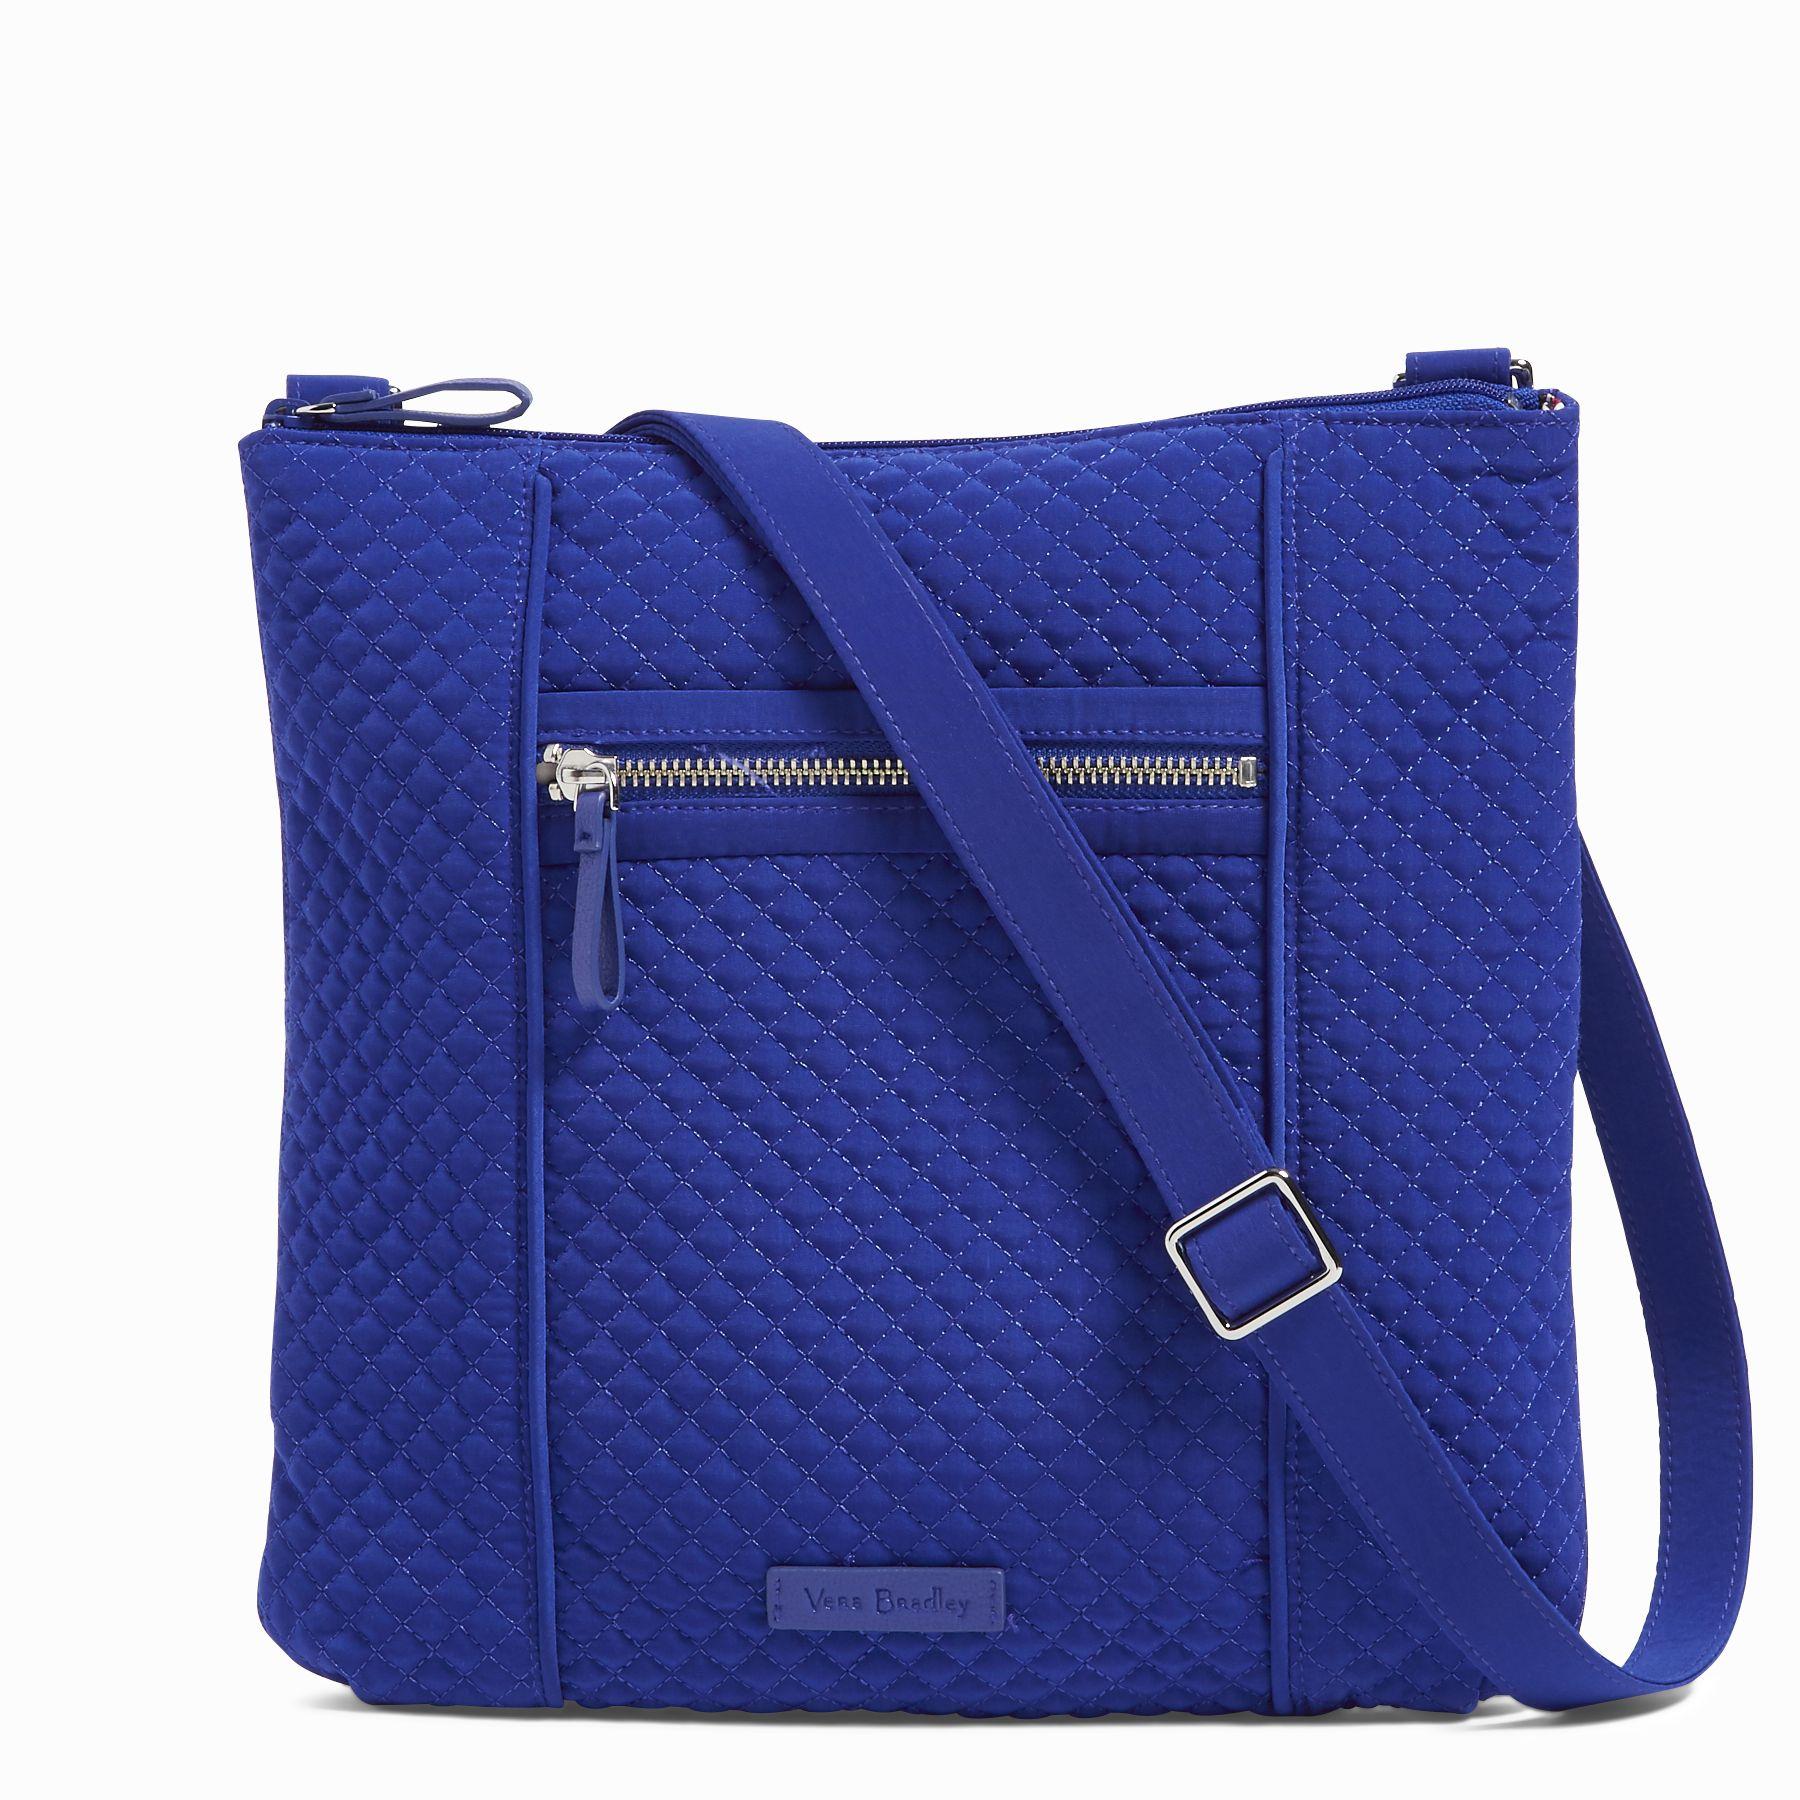 Vera Bradley Iconic Hipster Women's Crossbody Bag